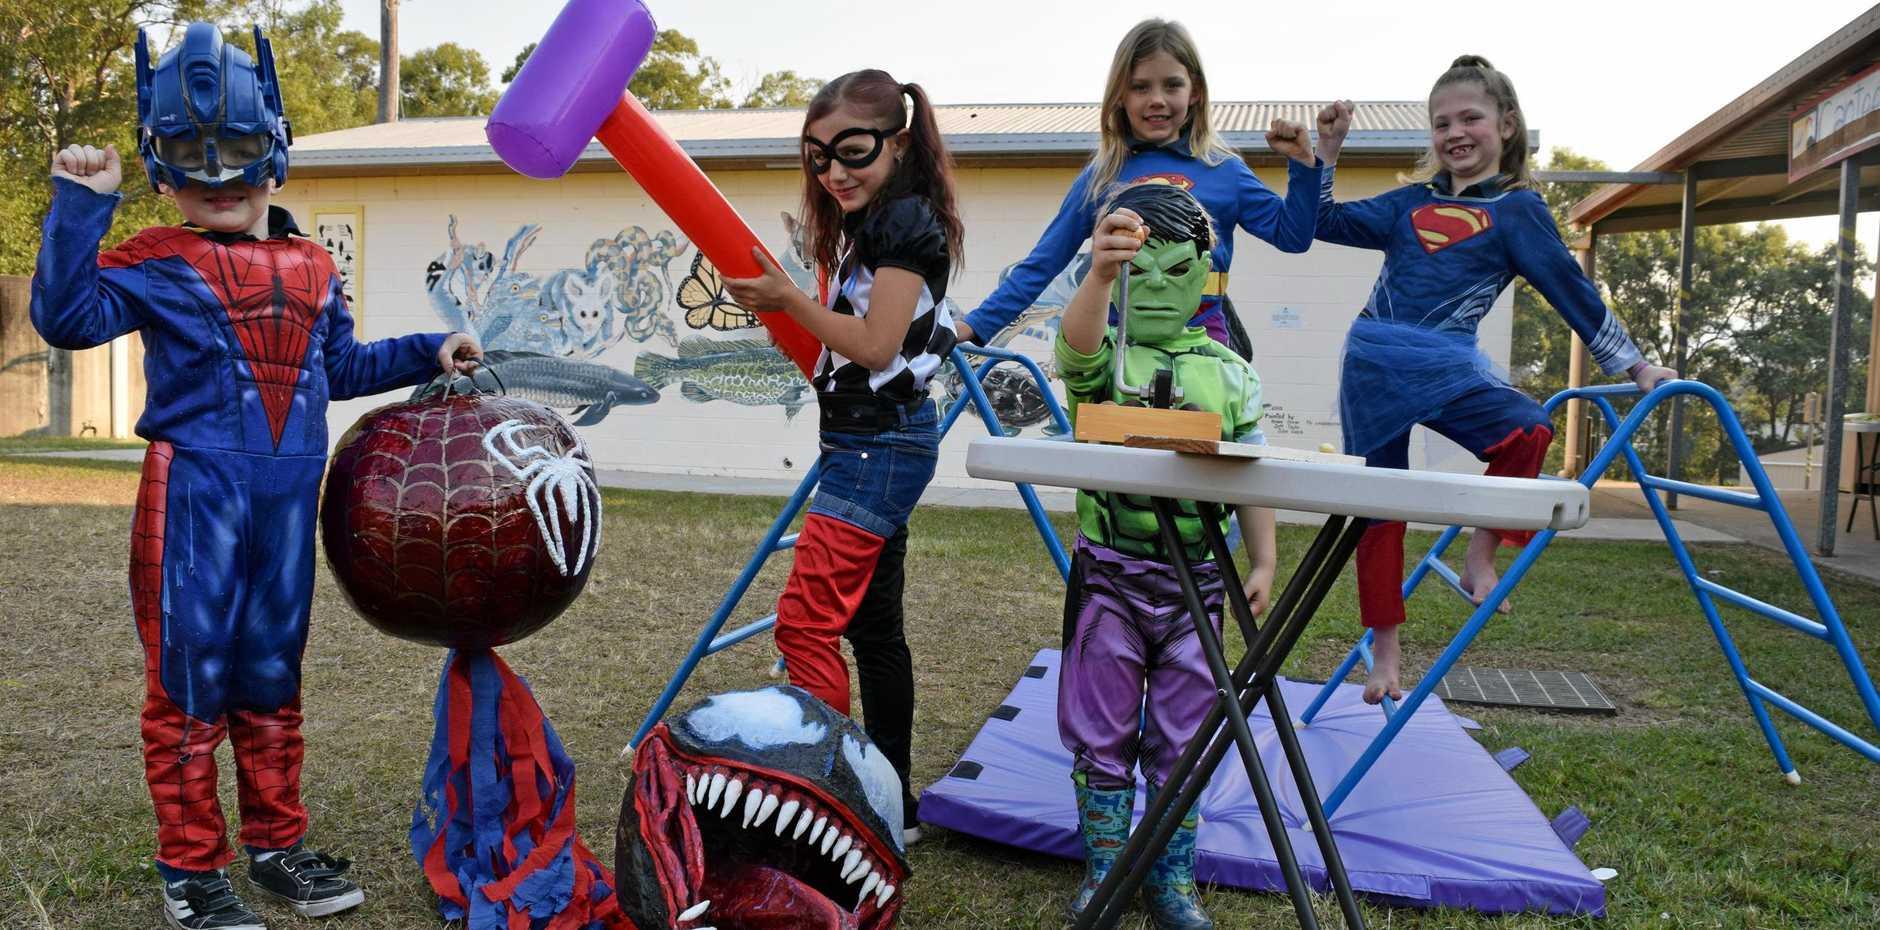 Dress up for the Bauple Nut Bash like last year's super hero theme (from left) Spiderman aka William Aldridge, Harley Quinn aka Abby Mooney, Hulk aka Ethan Mooney, and Supergirls Eva Whyte (left) and Lilly Scott.